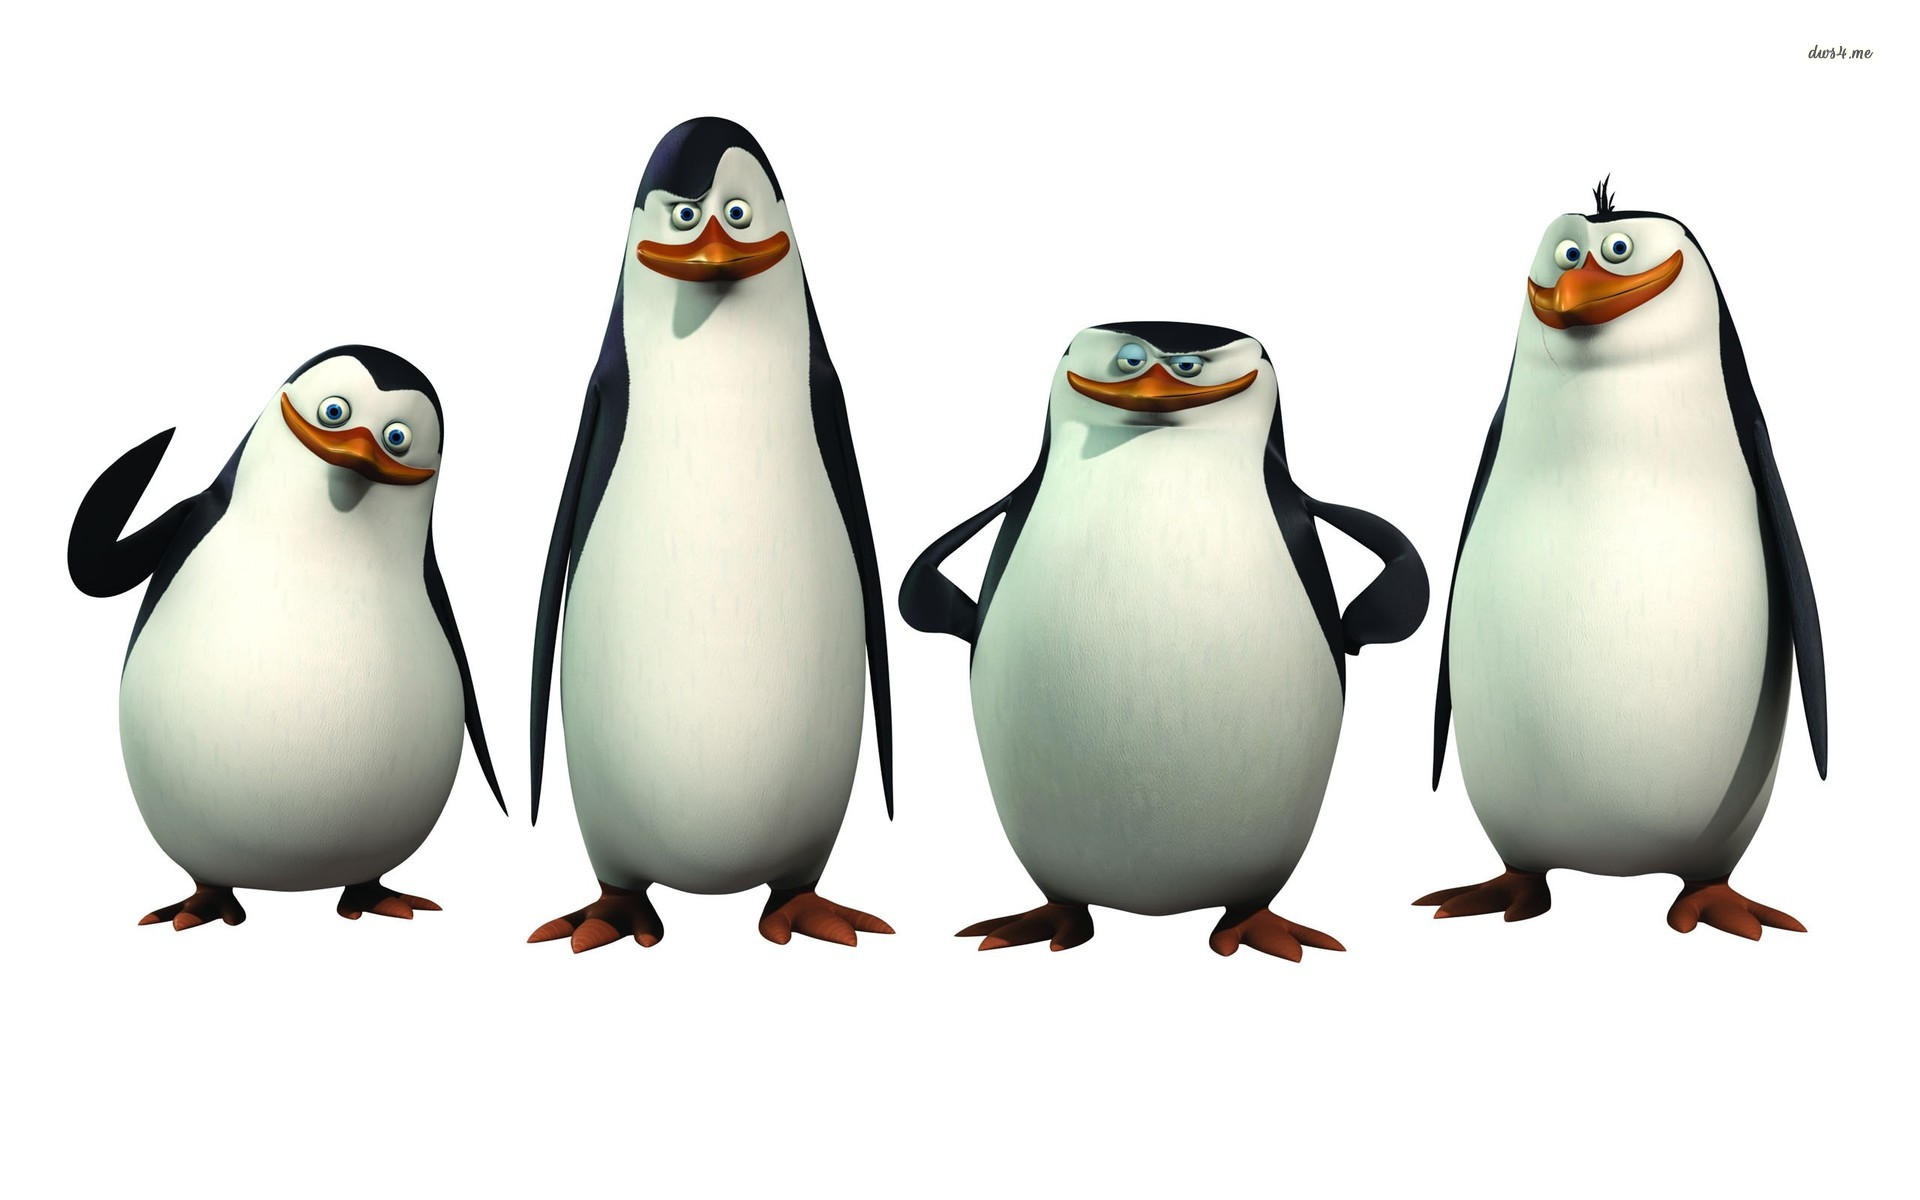 Penguins of madagascar clipart.